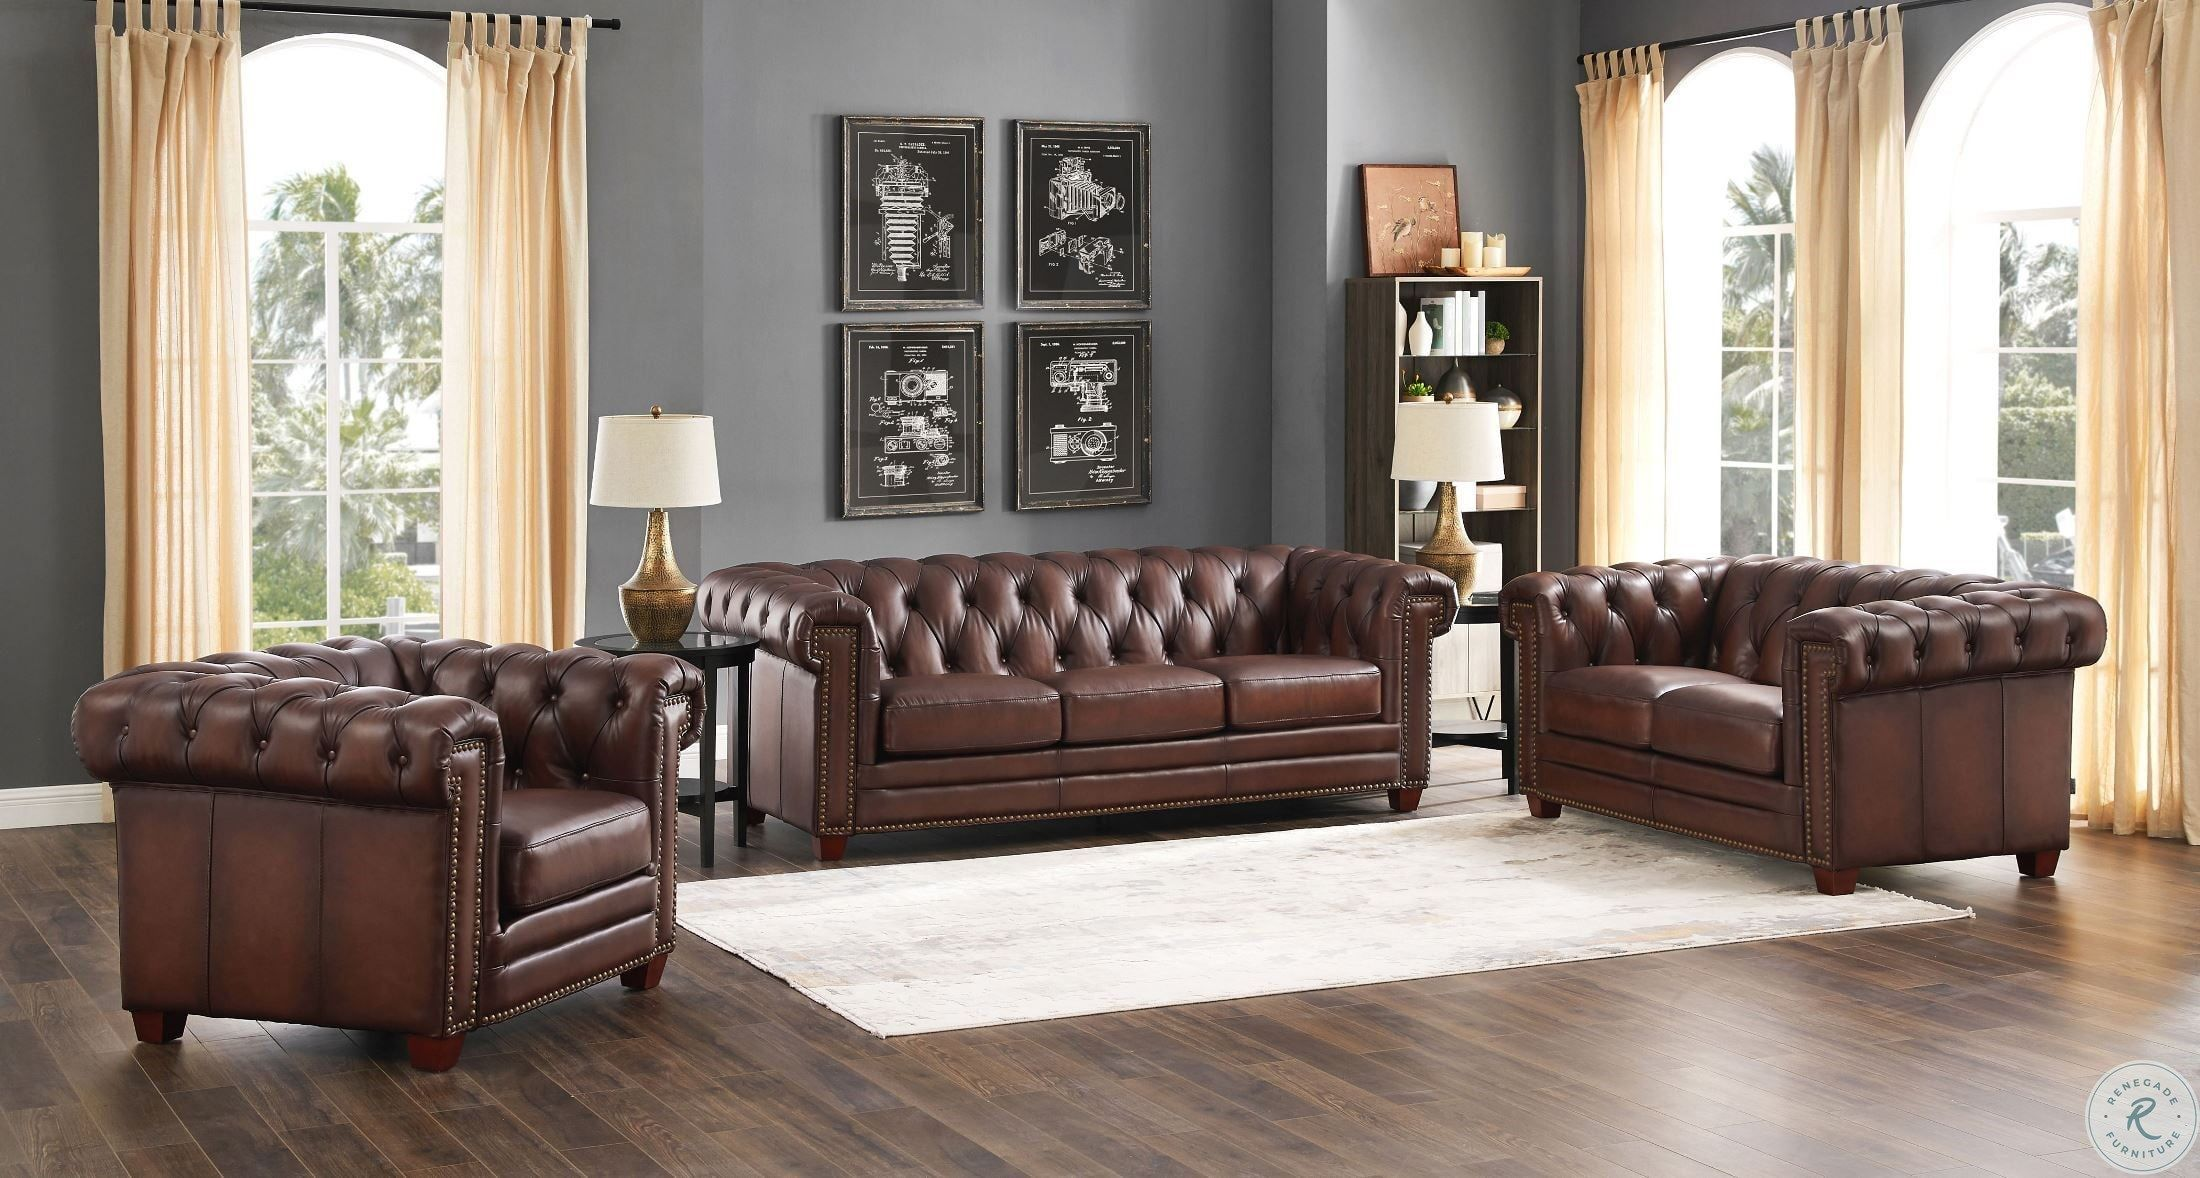 Monaco Pearl White Leather Sofa In 2021 Living Room Leather Leather Living Room Set Living Room Sets Real leather living room sets